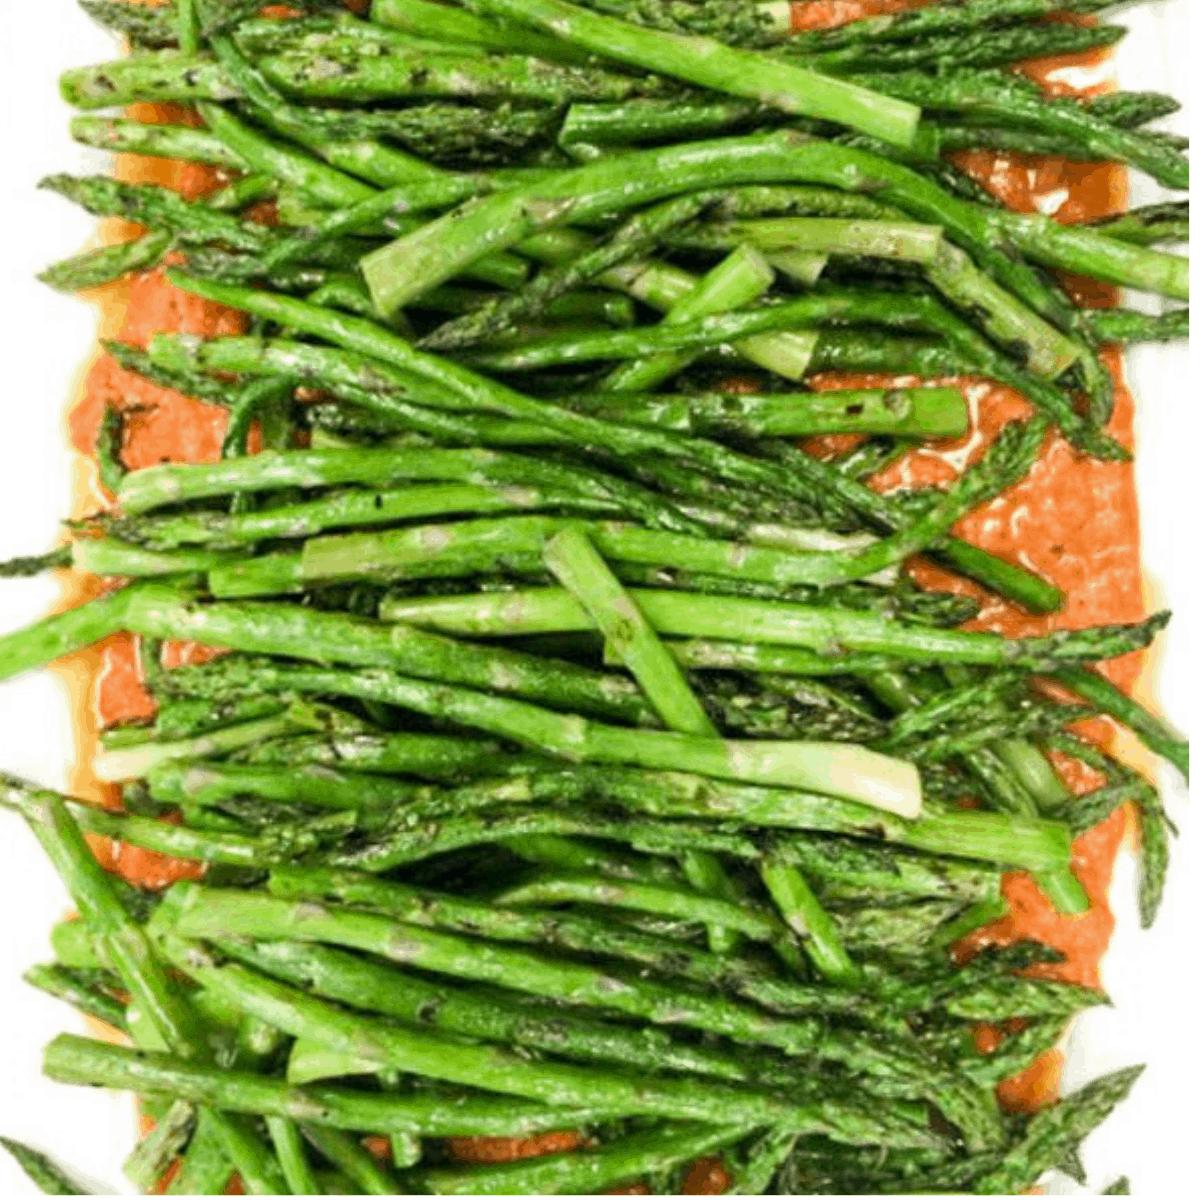 platter of asparagus on top of romesco sauce